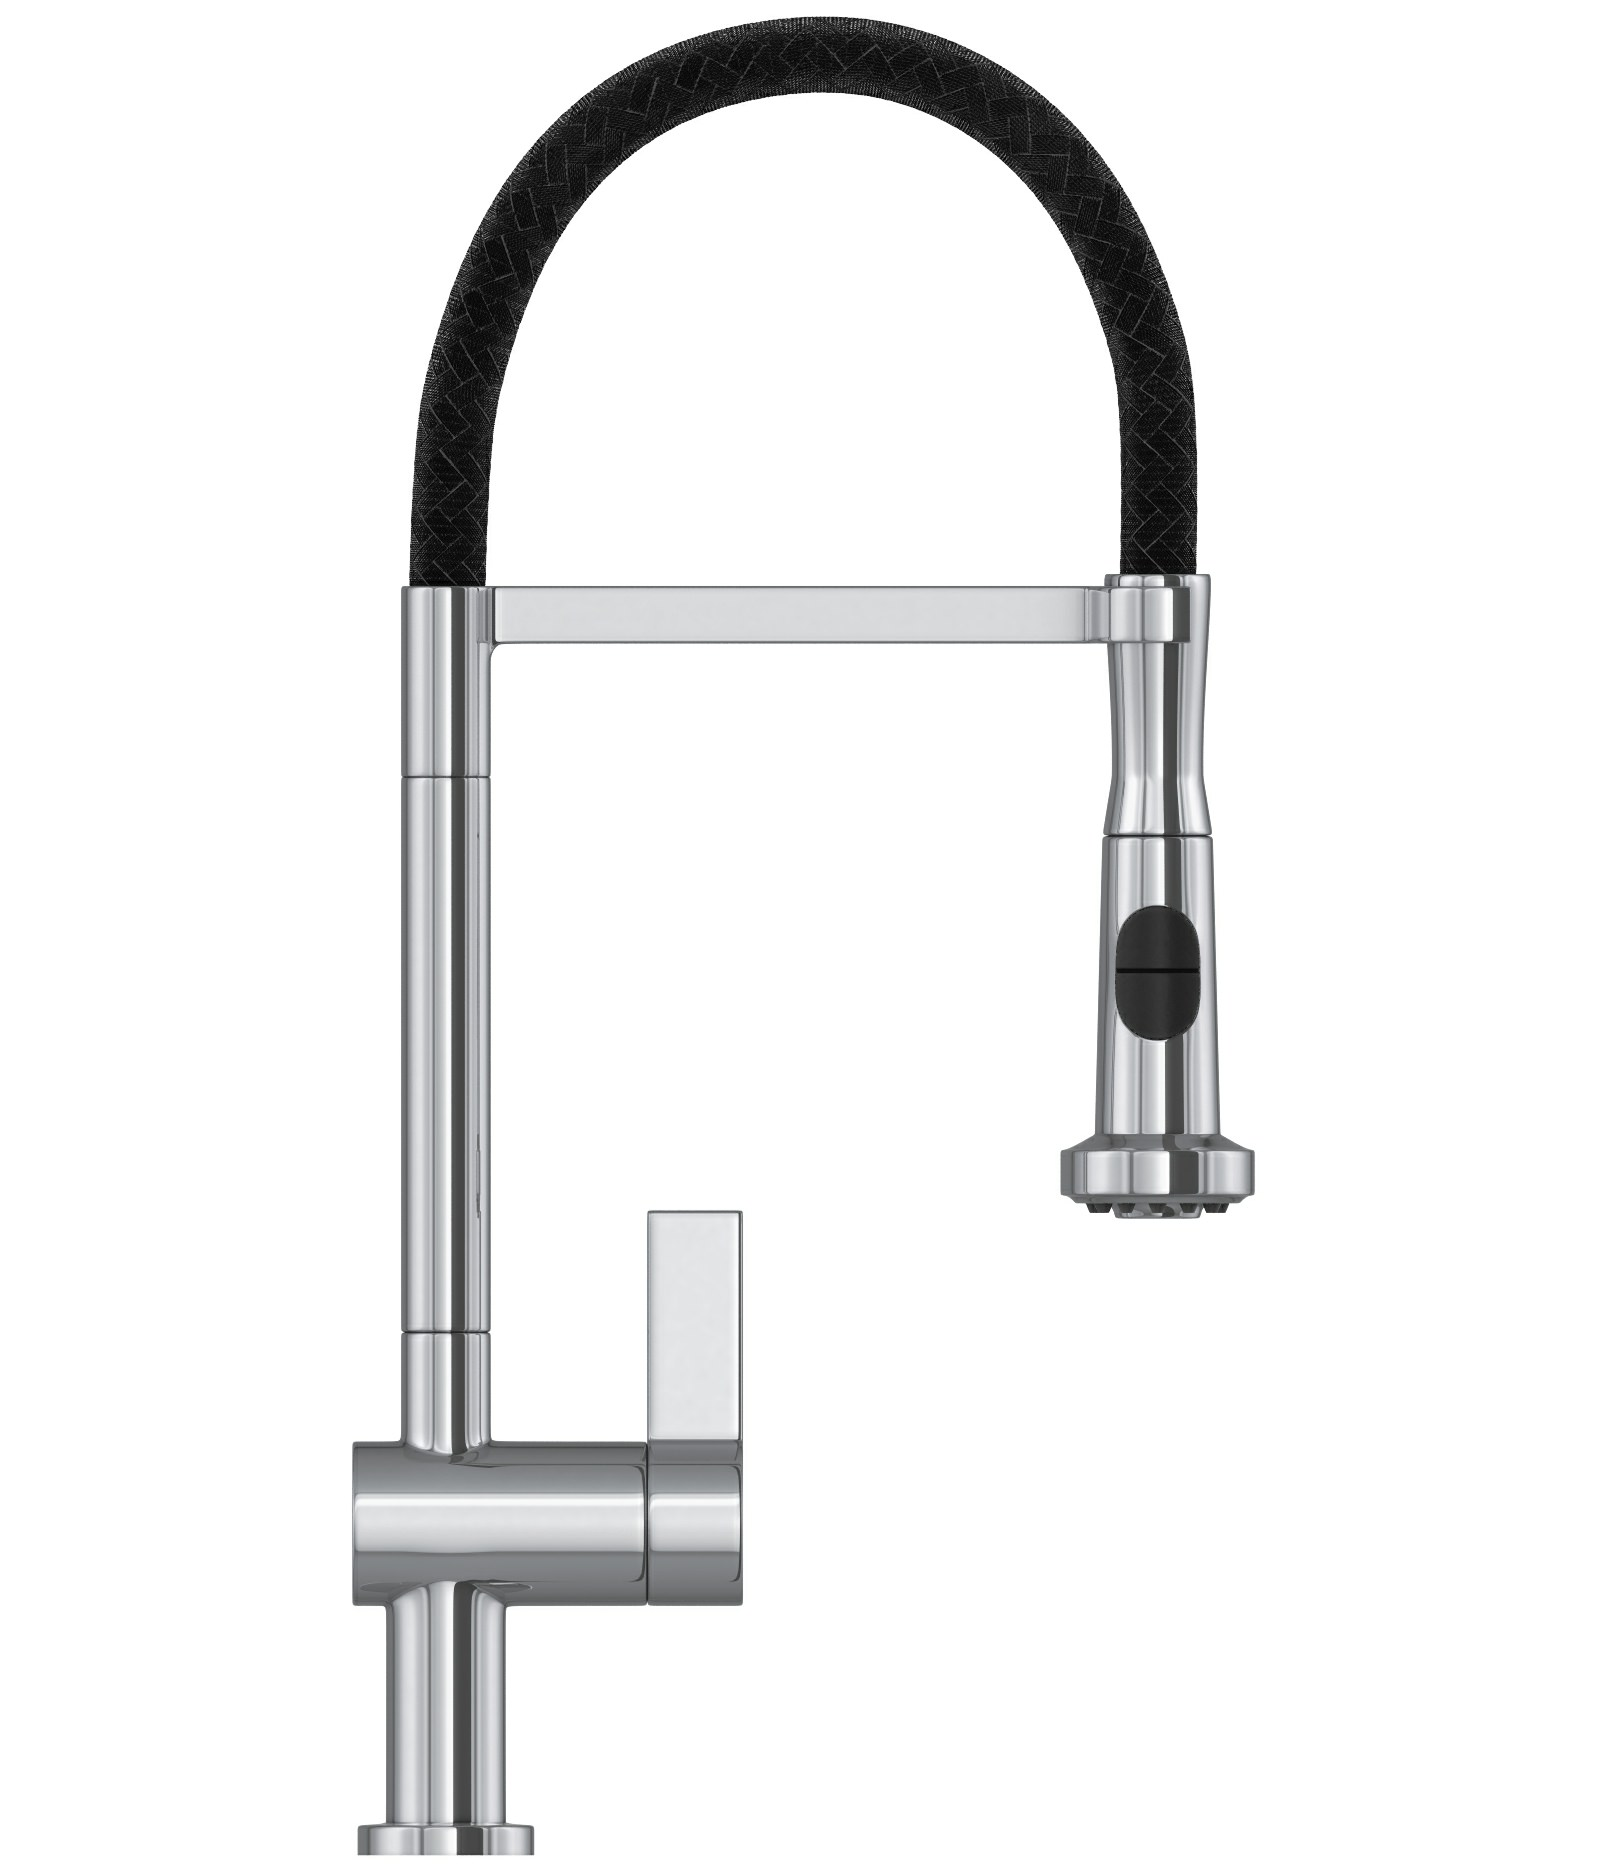 Franke Sirino Pull-Out Spray Chrome Kitchen Sink Mixer Tap